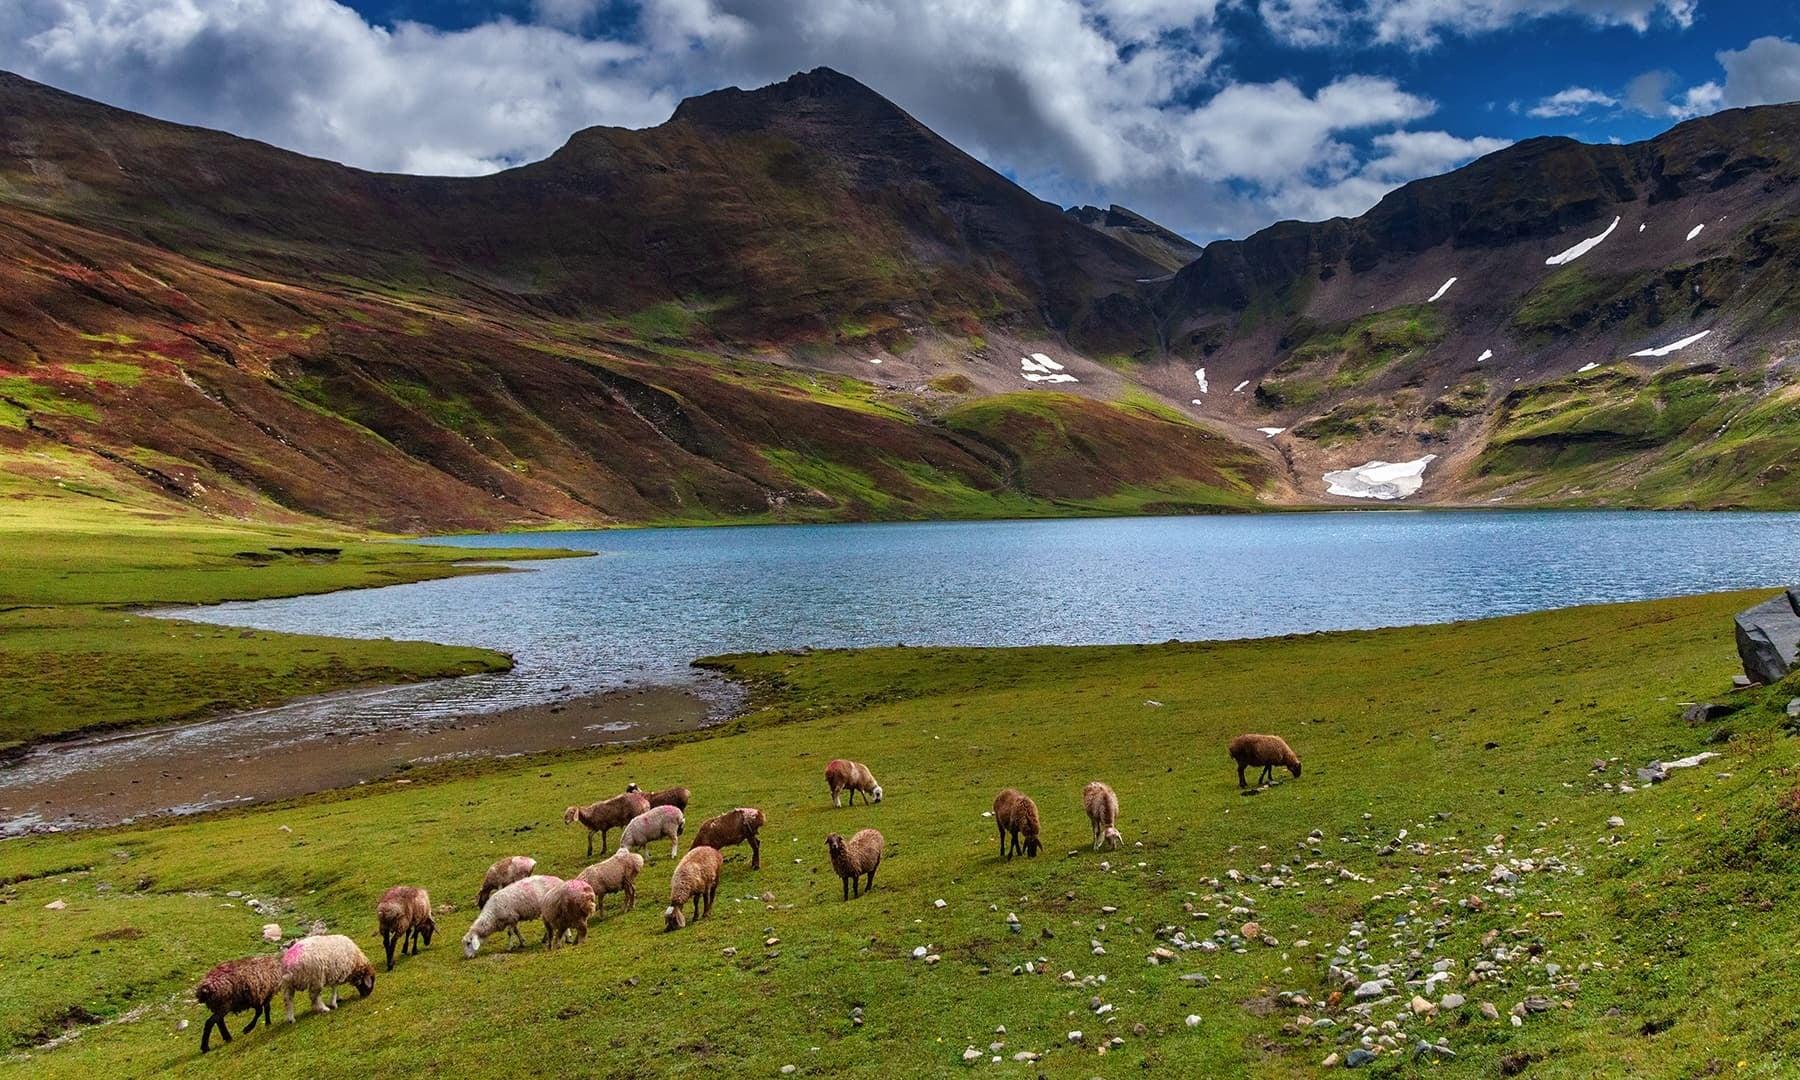 Dudipatsar Lake. — Photo by Syed Mehdi Bukhari